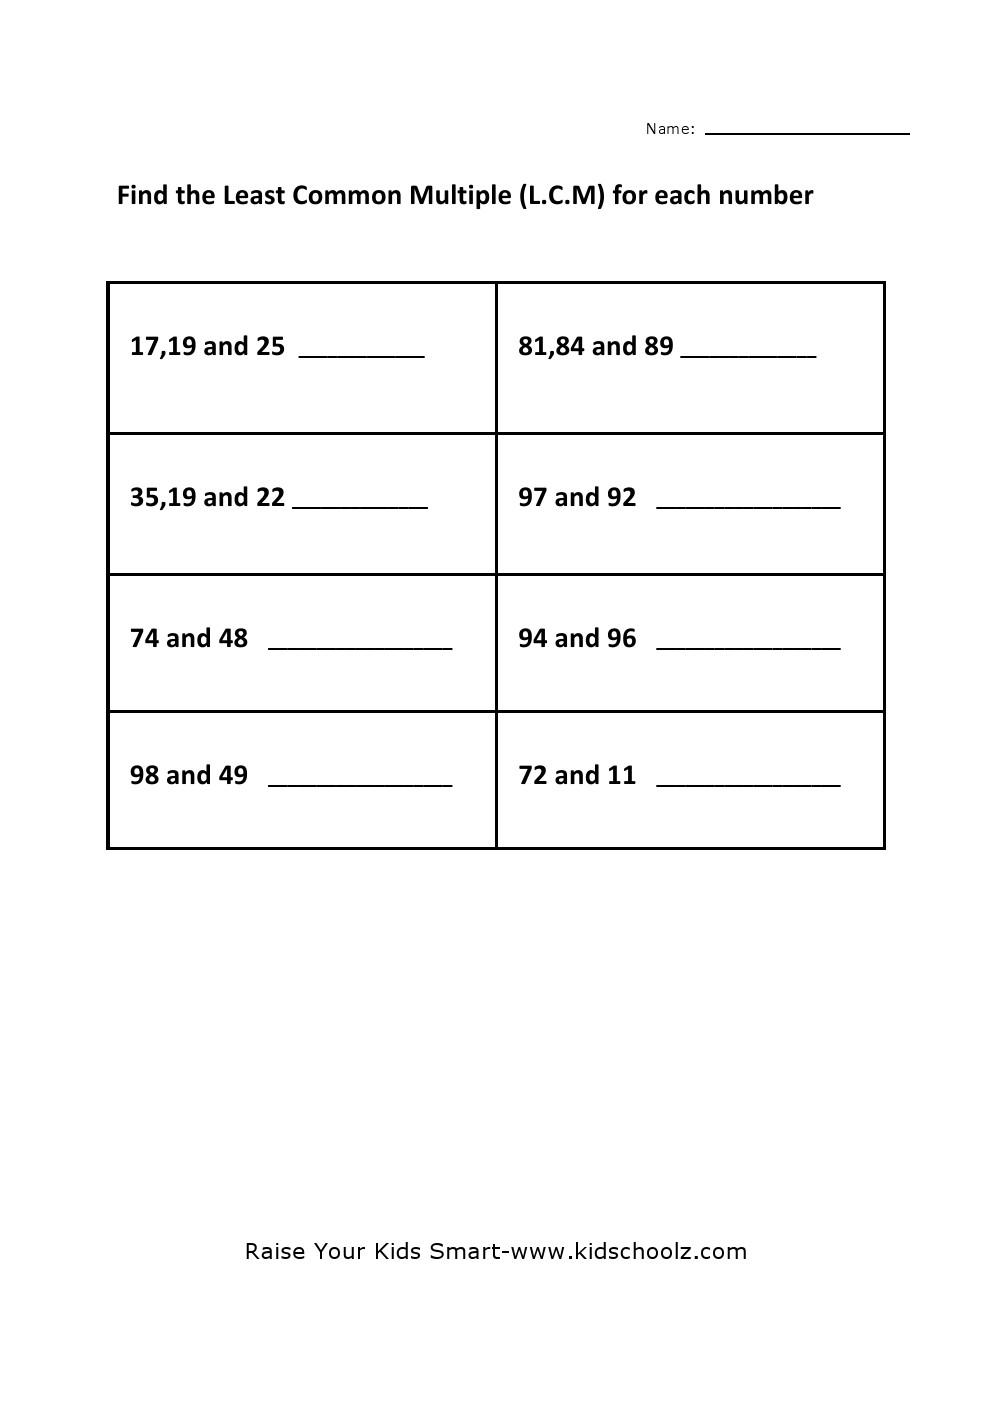 Worksheets Lcm Worksheet grade 4 least common multiple lcm worksheet kidschoolz worksheet